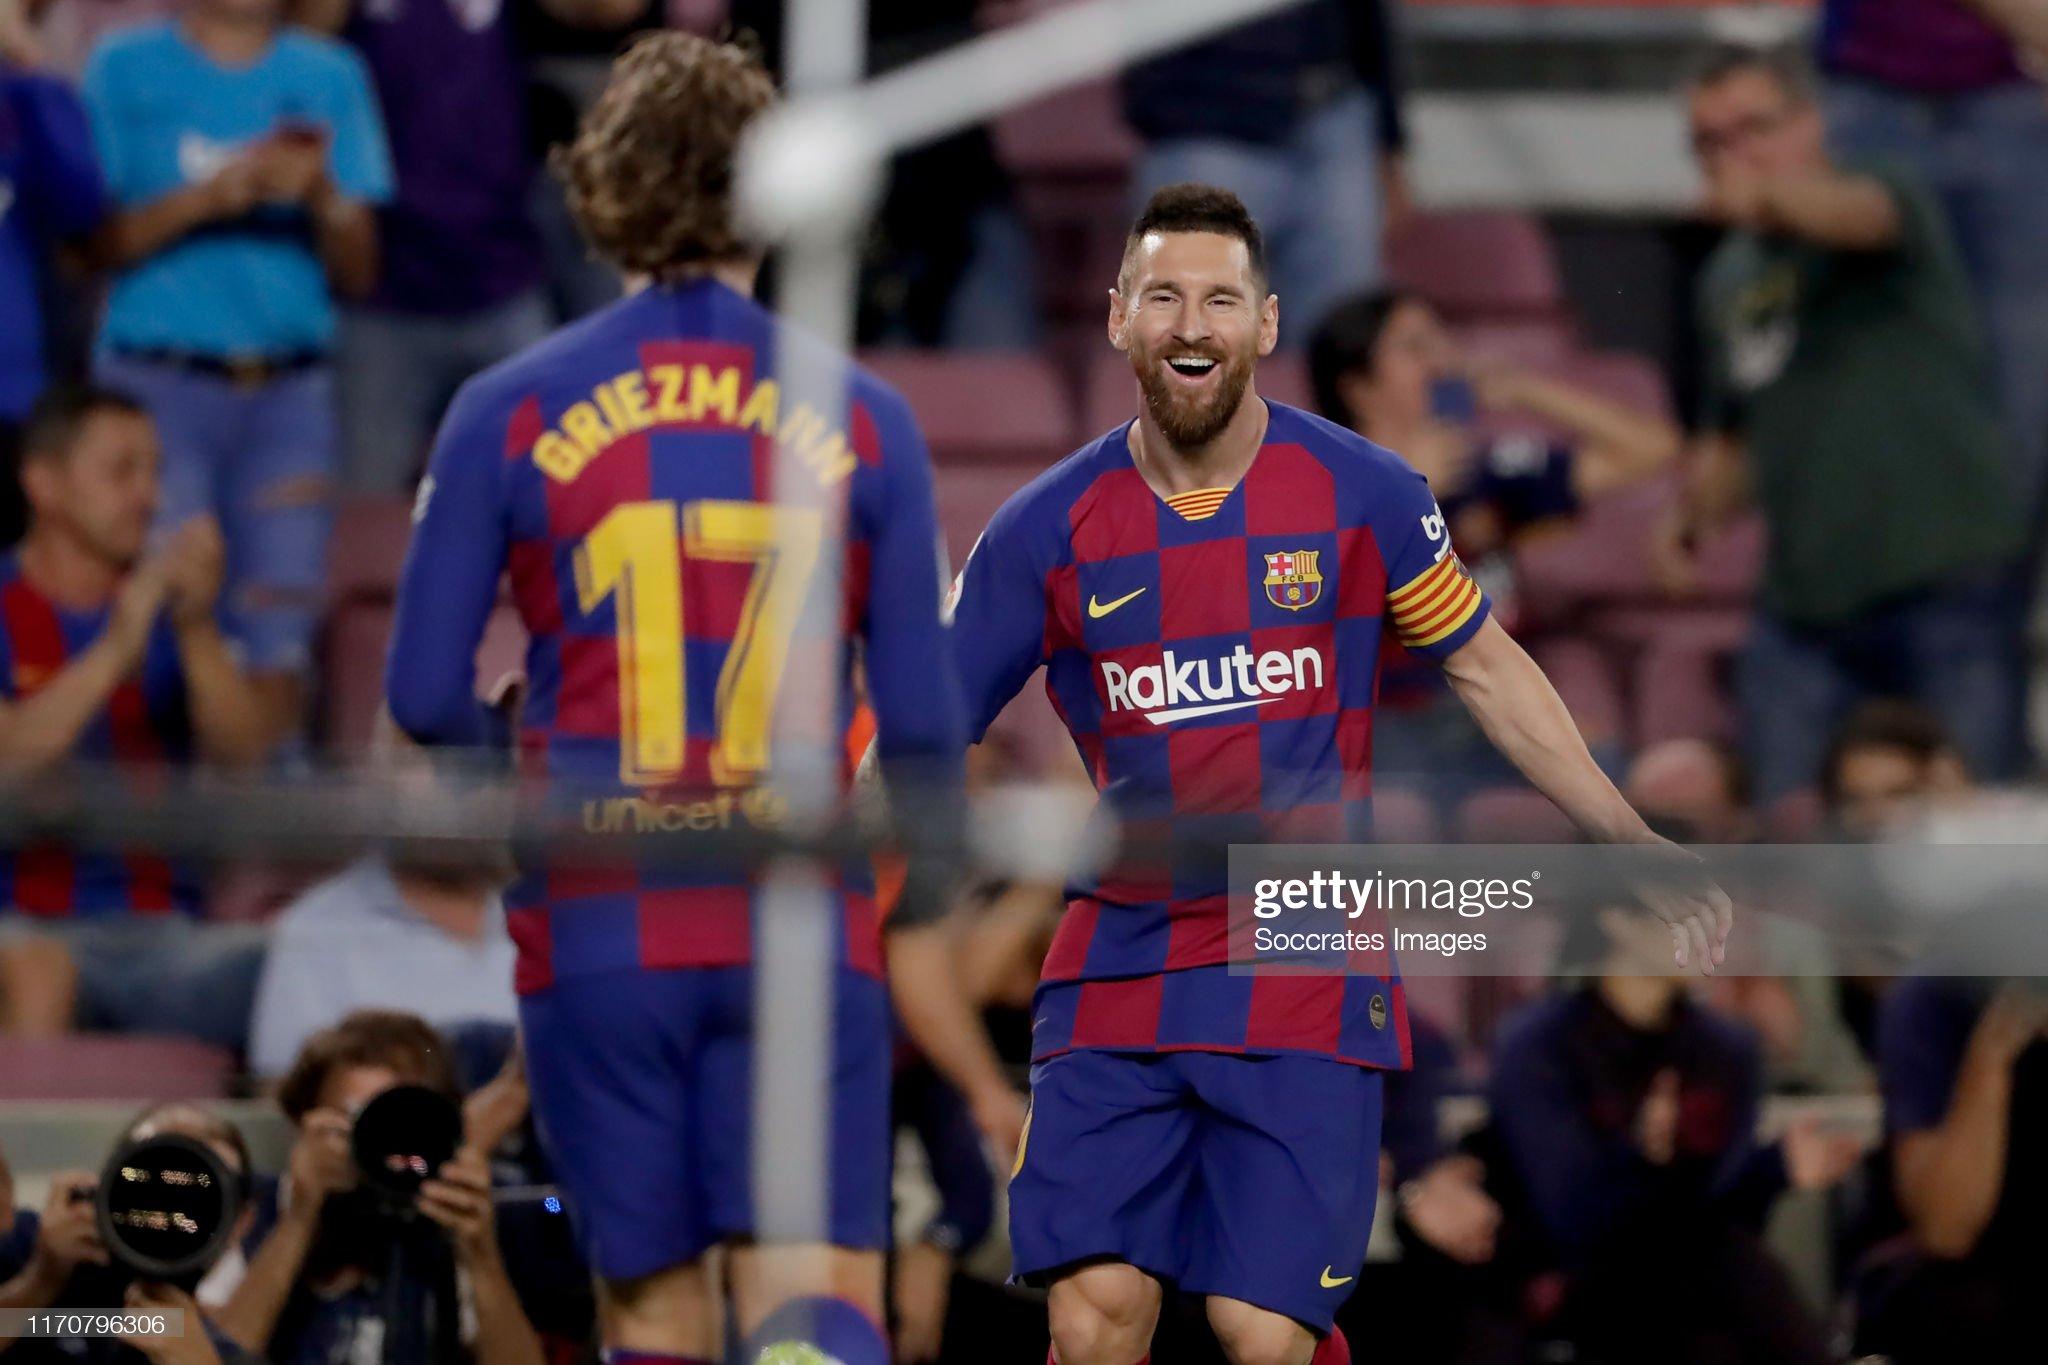 صور مباراة : برشلونة - فياريال 2-1 ( 24-09-2019 )  Antoine-griezmann-of-fc-barcelona-lionel-messi-of-fc-barcelona-10-picture-id1170796306?s=2048x2048